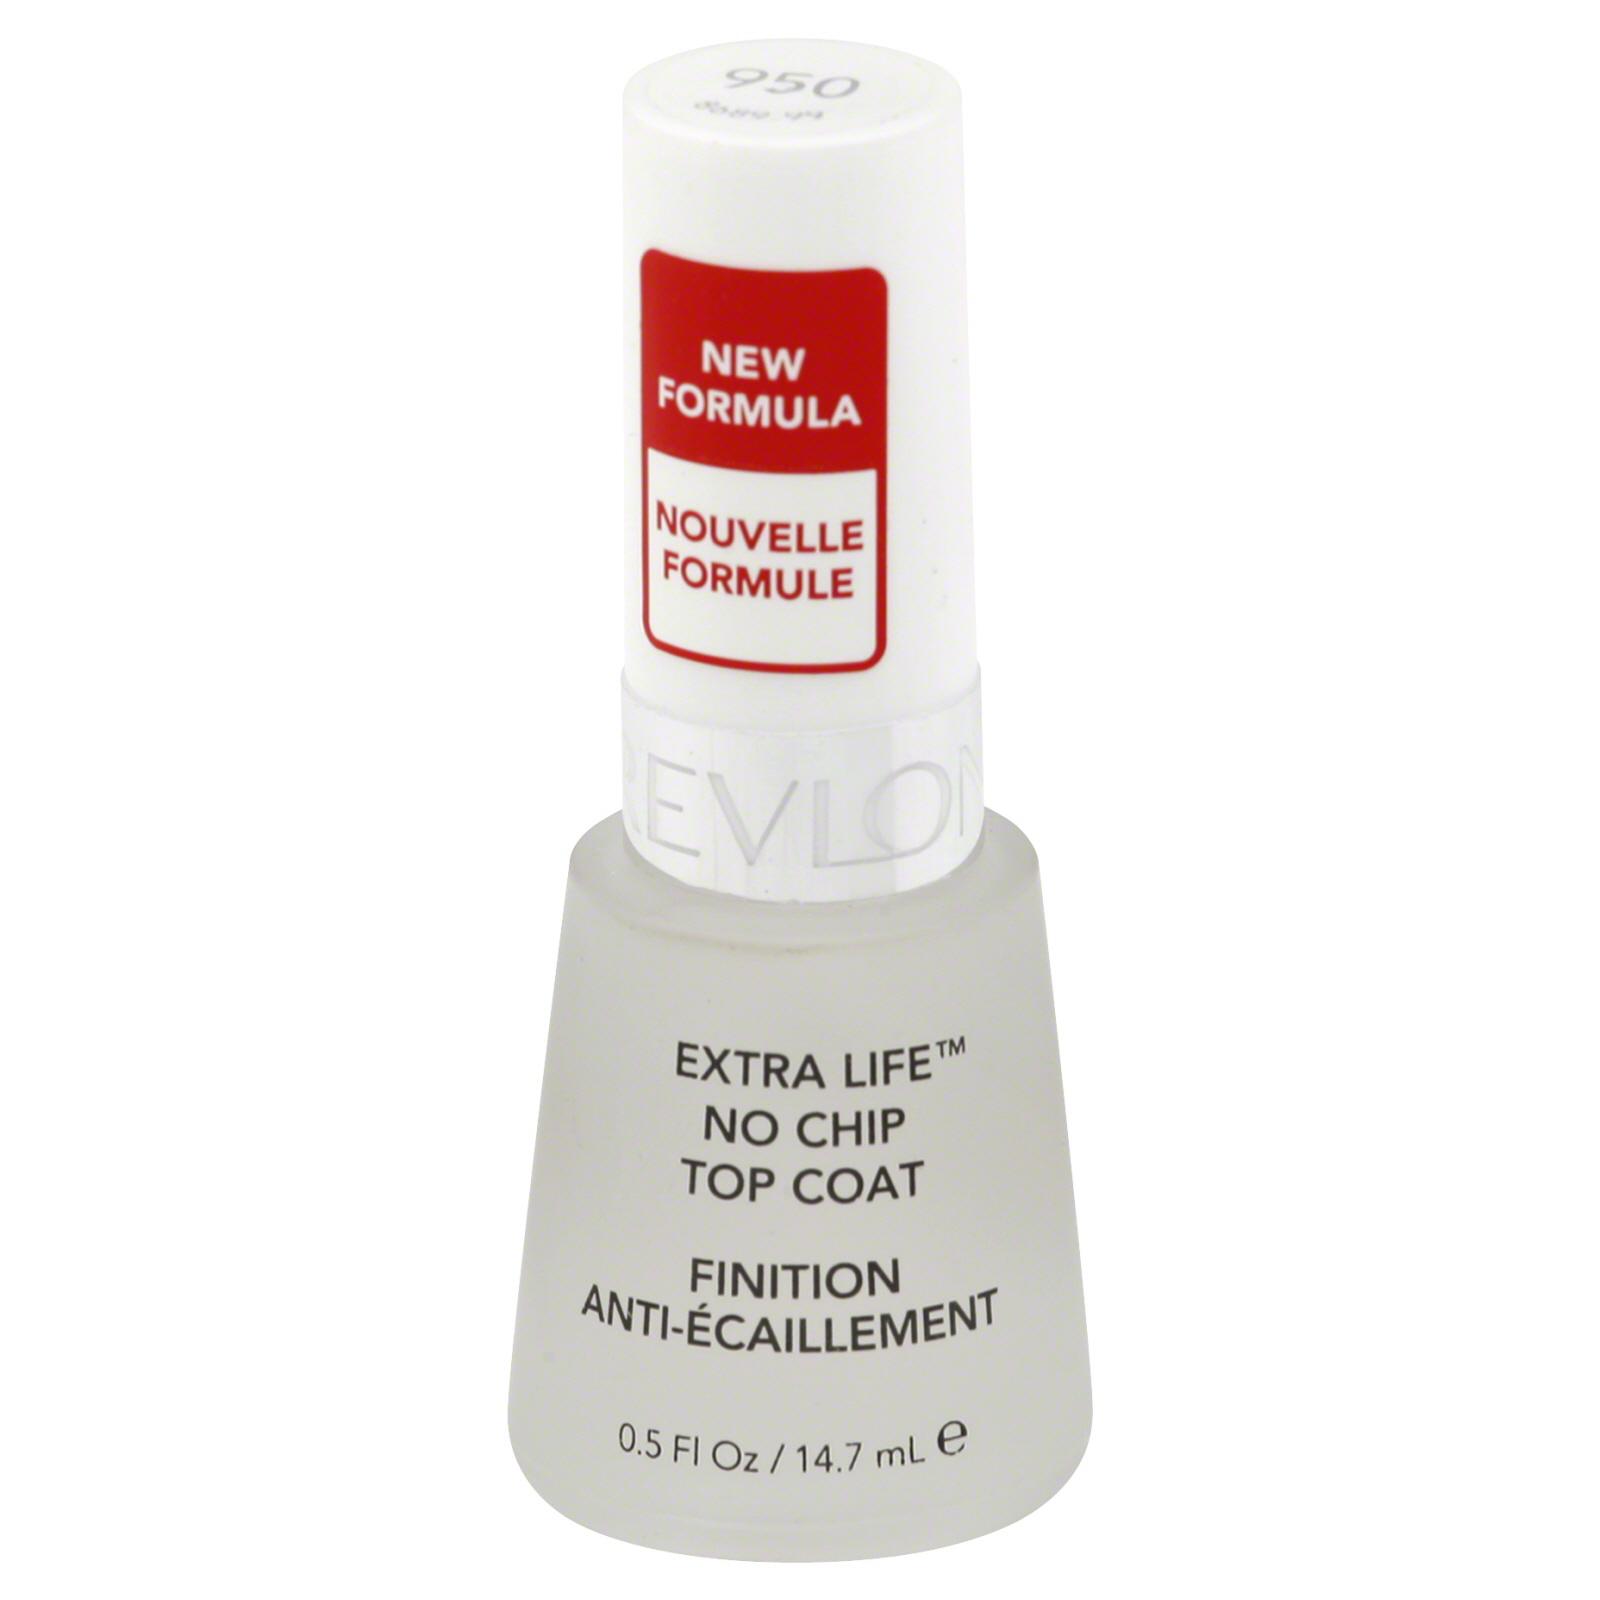 revlon top coat chip extra